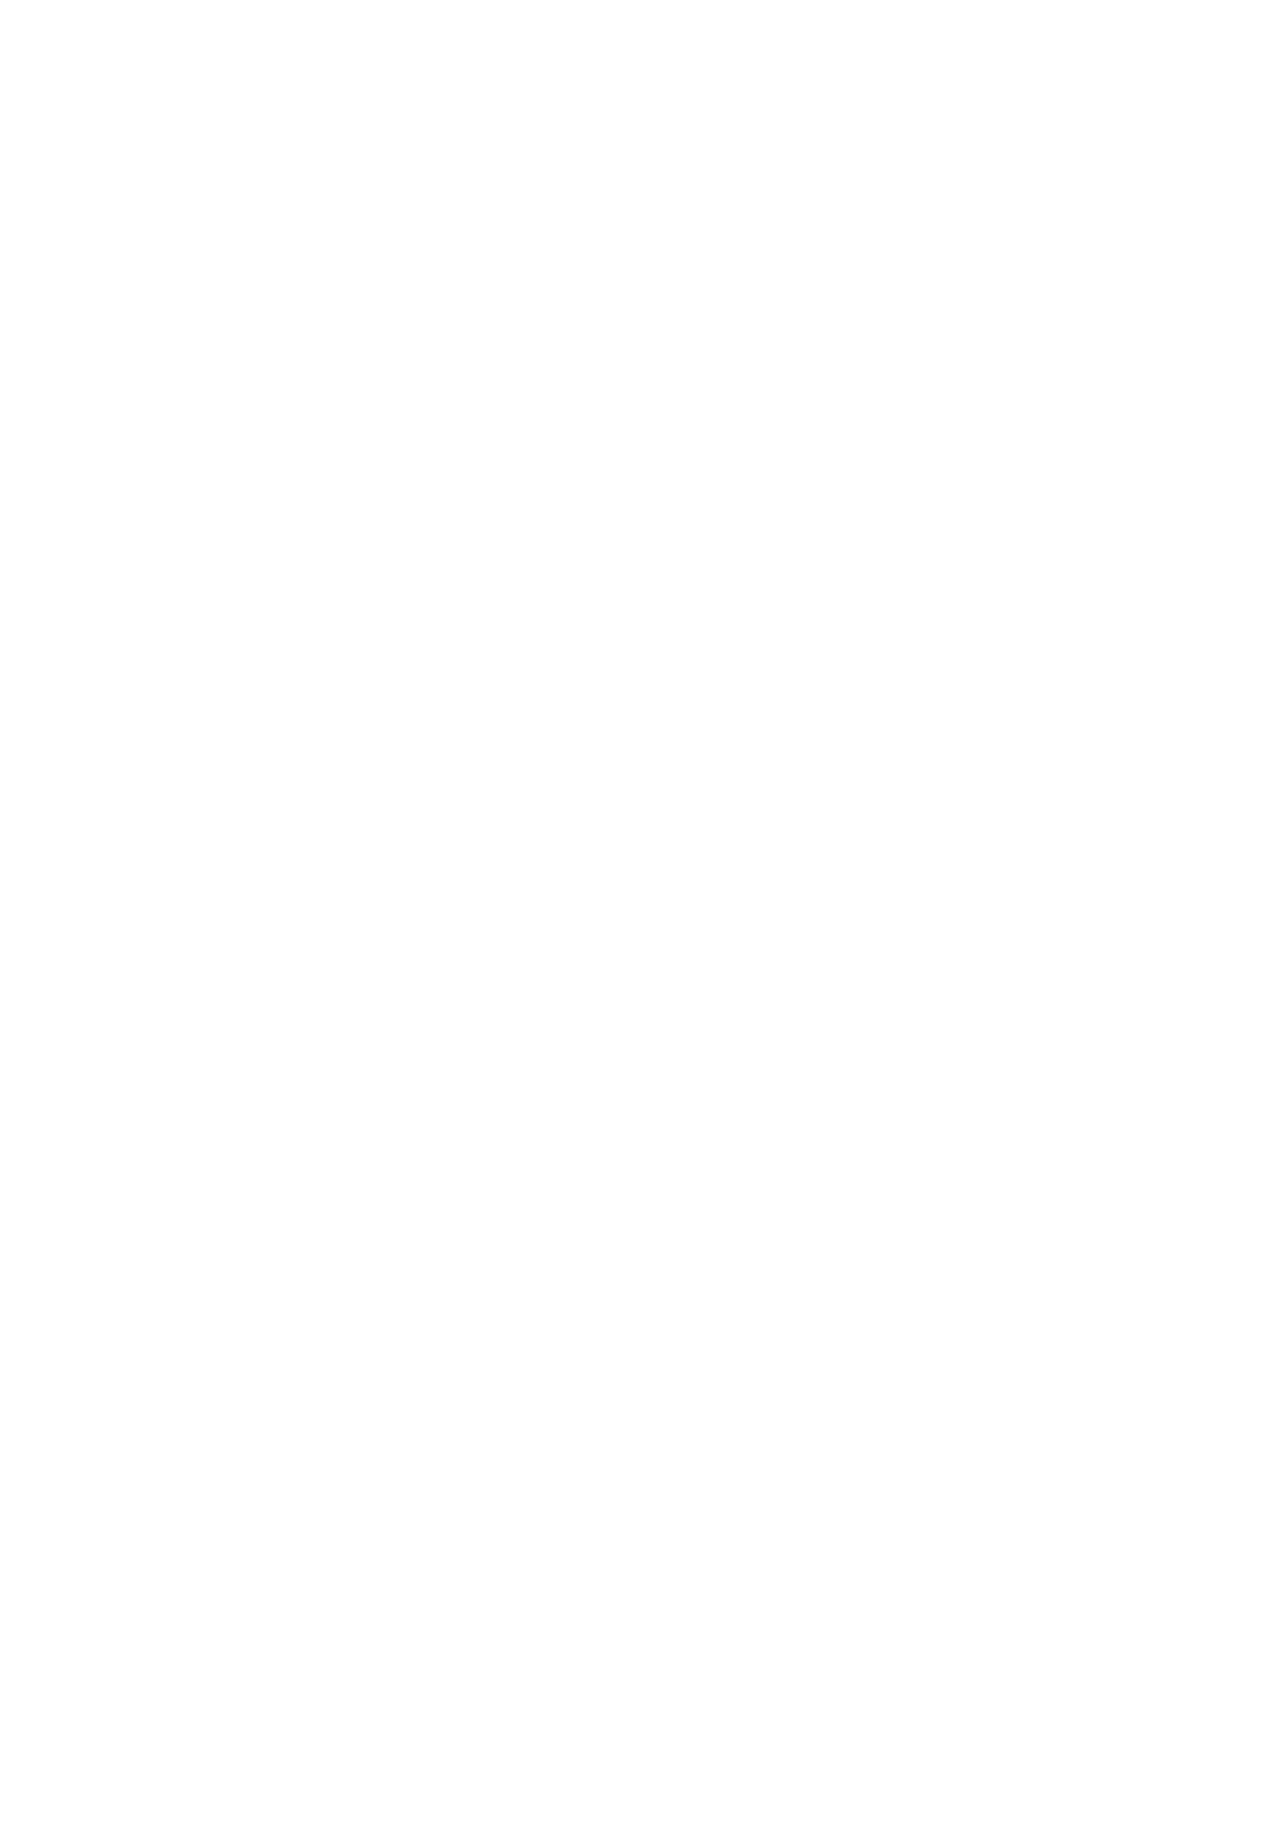 https://digital.tessmann.it/mediaArchive/media/image/Page/TIR/1920/15_12_1920/TIR_1920_12_15_4_object_1974656.png?auth=2cc90d1c281ddd570646ed22d10b6ea0